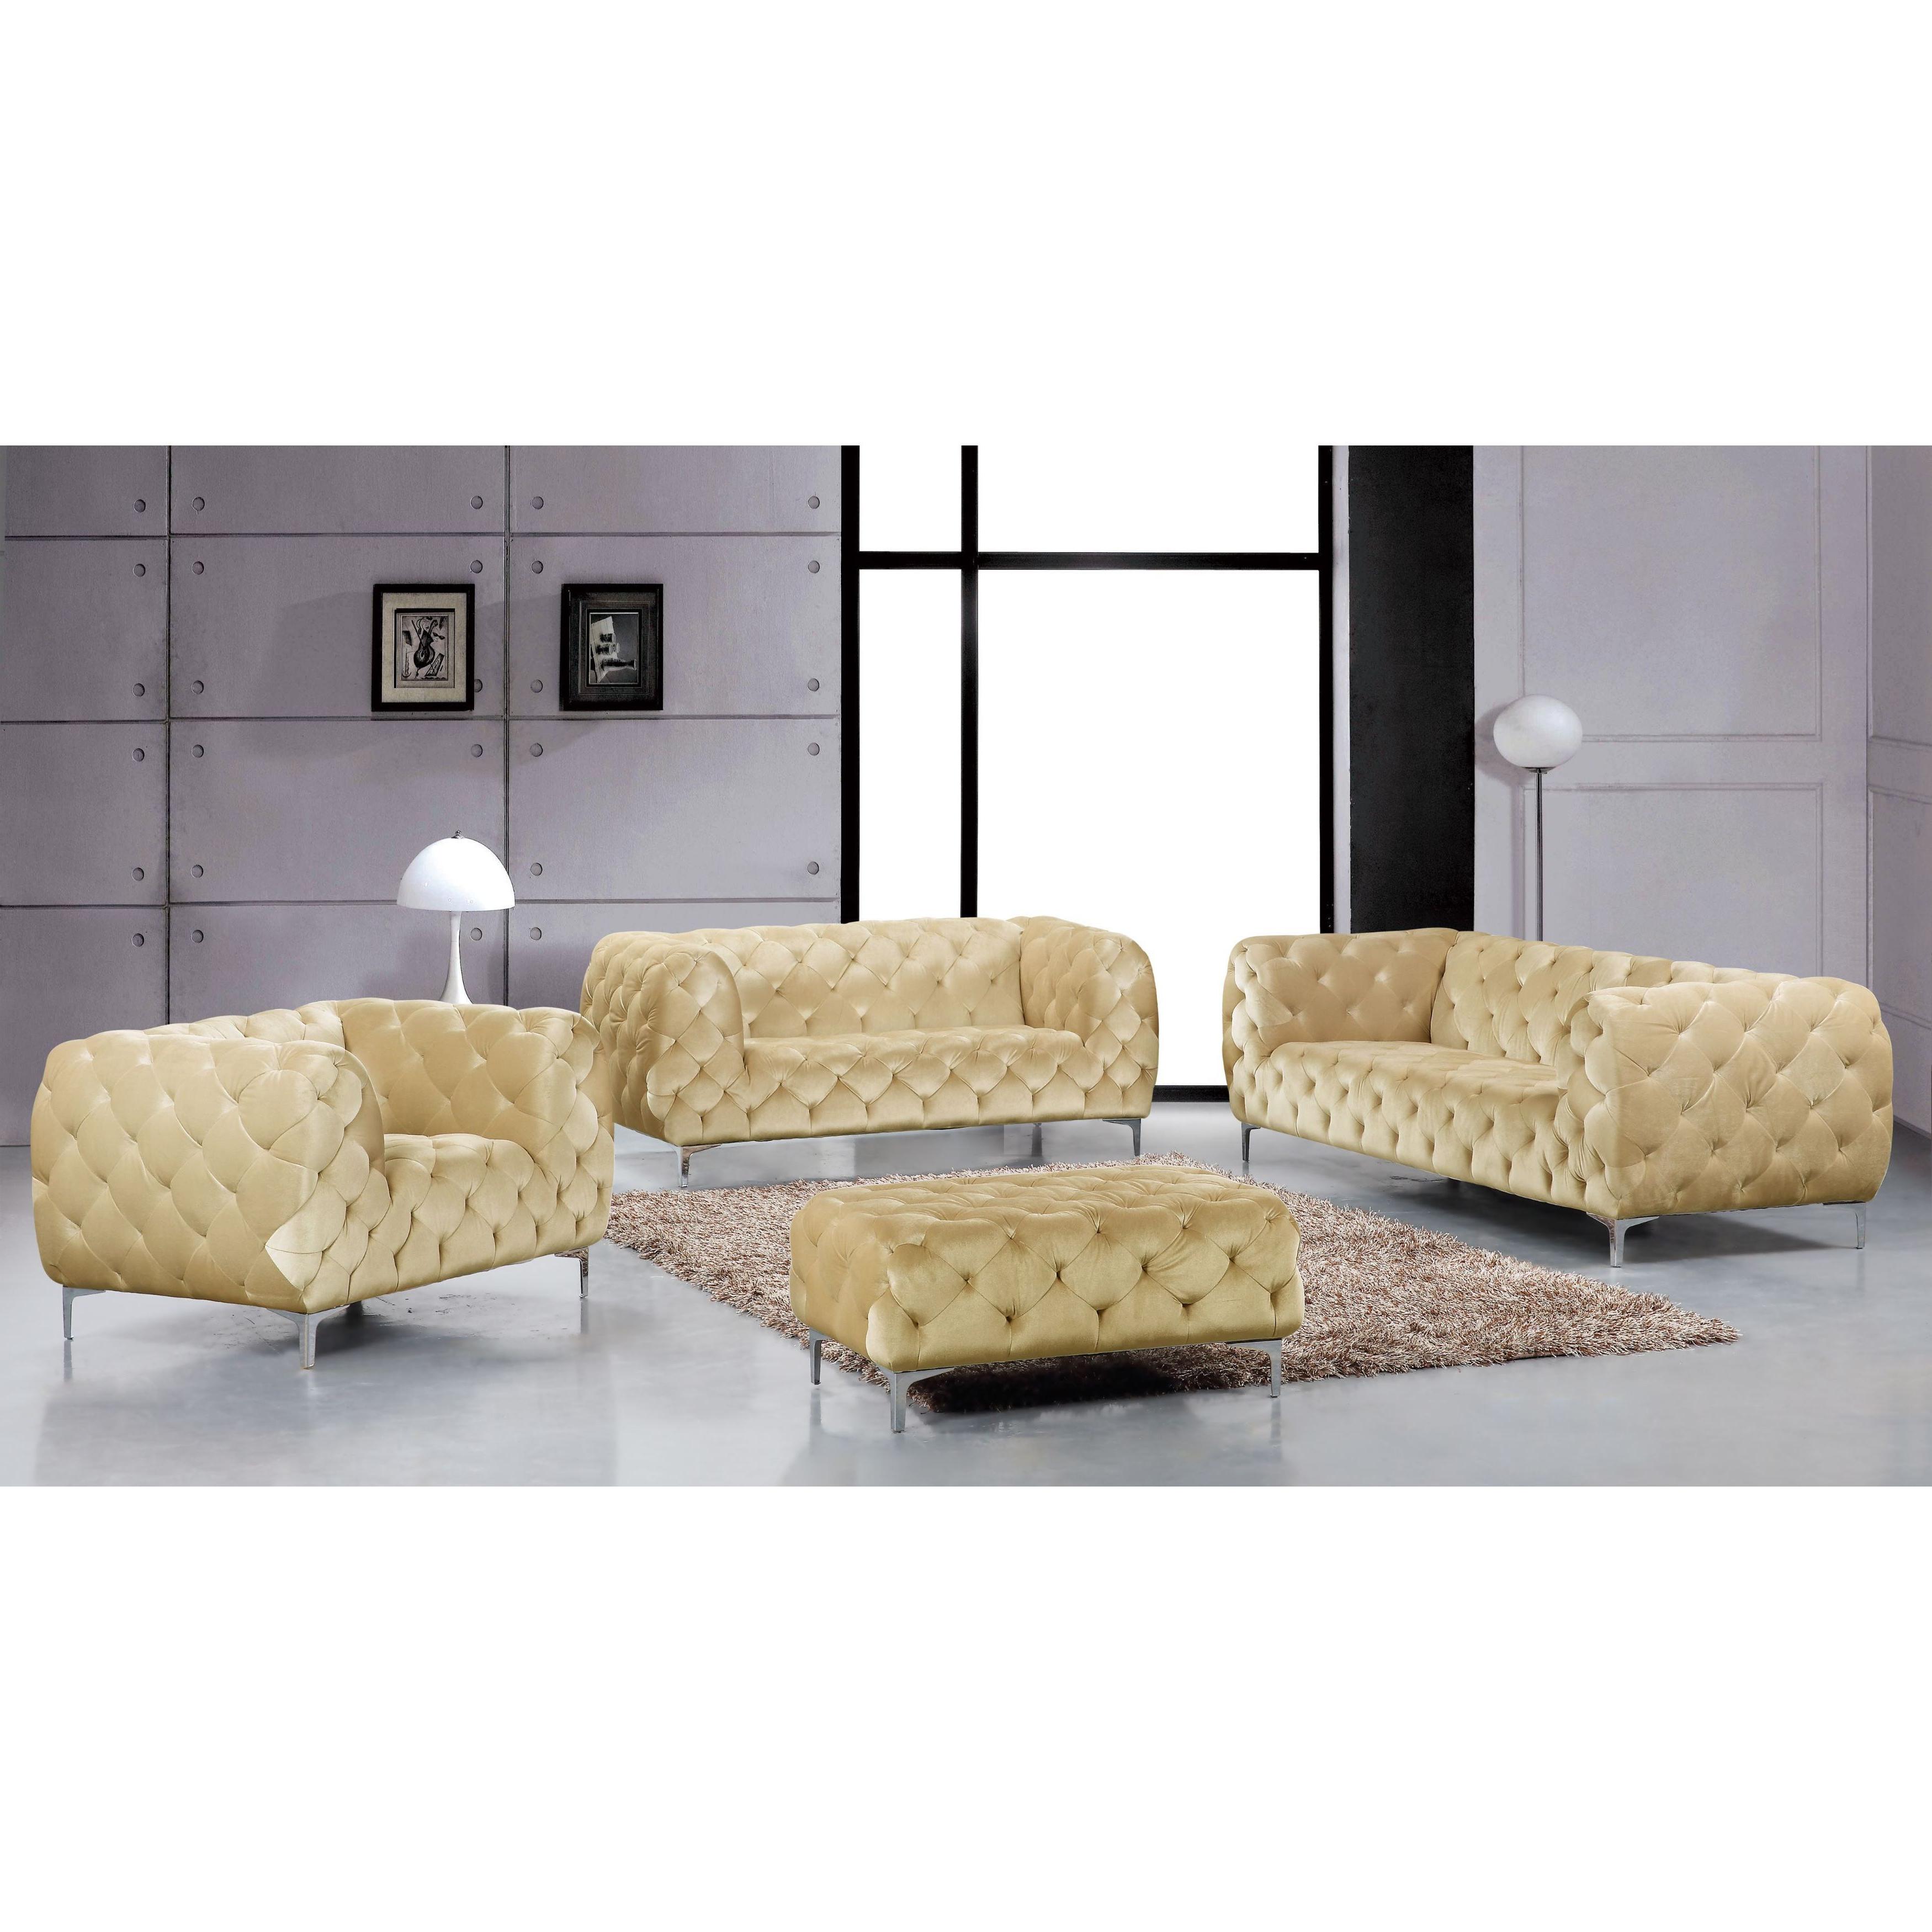 Shop Meridian Mercer Beige Velvet 4 Piece Furniture Set – Free Inside Fashionable Mercer Foam Oversized Sofa Chairs (Gallery 18 of 20)